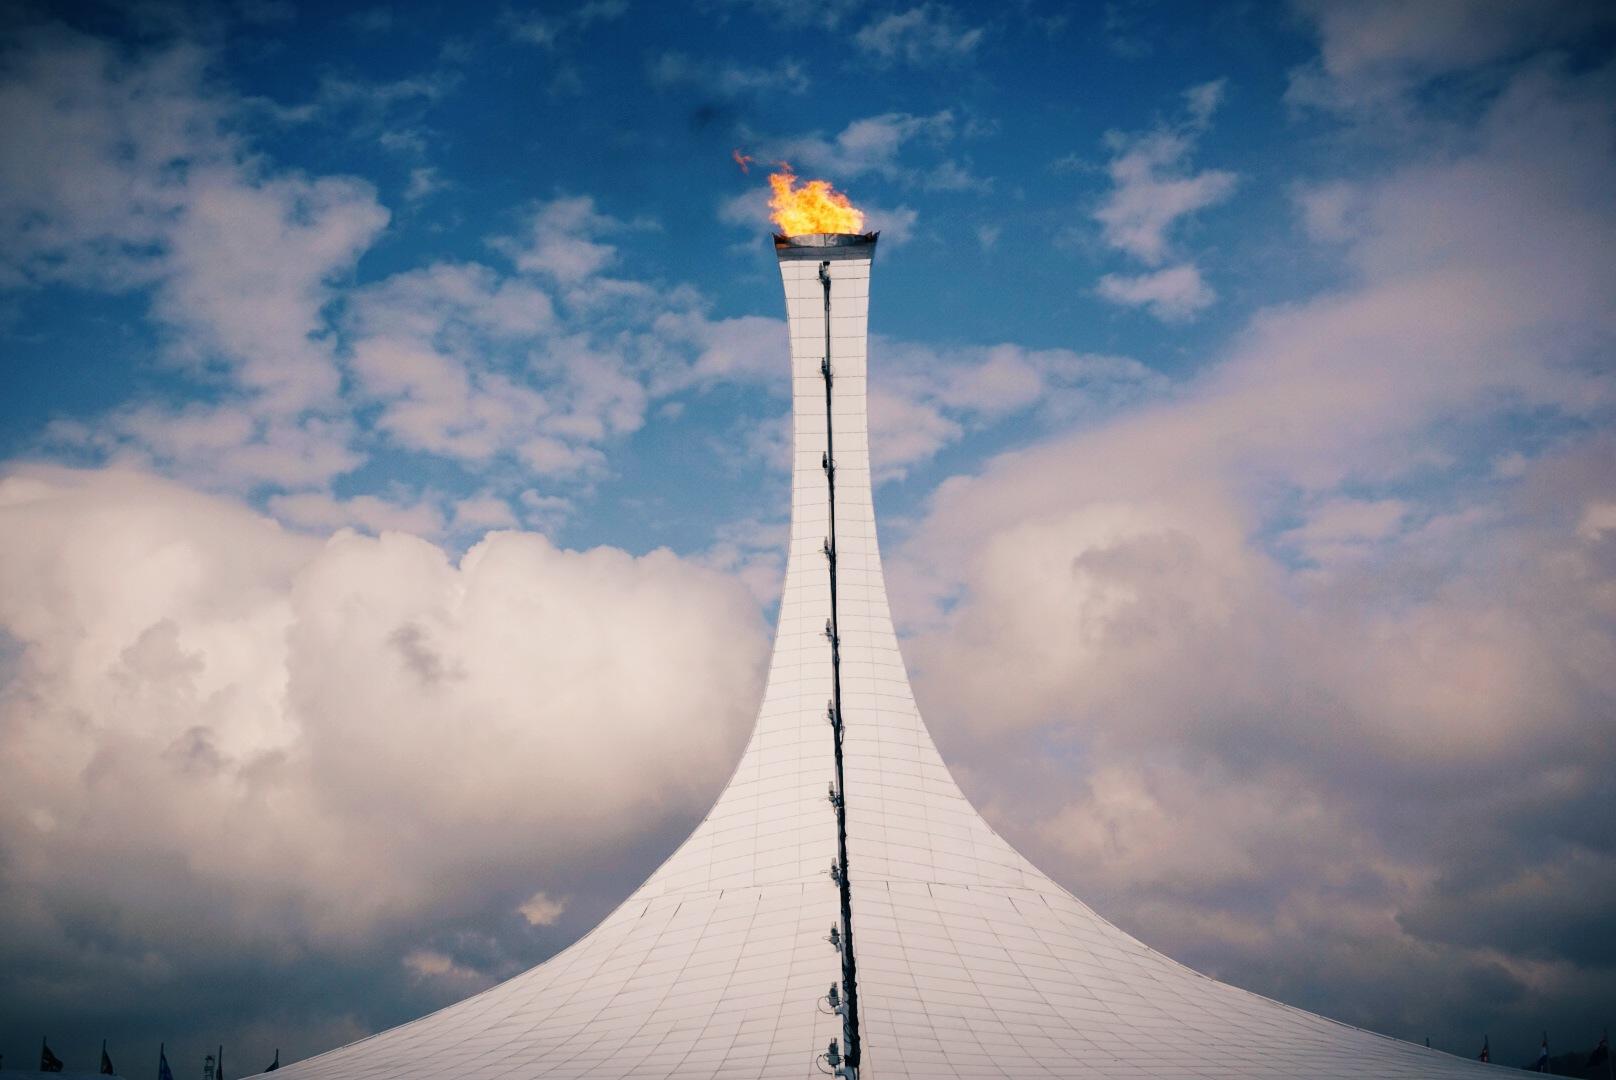 Олимпийский огонь в Олимпийском парке Сочи, Сочи